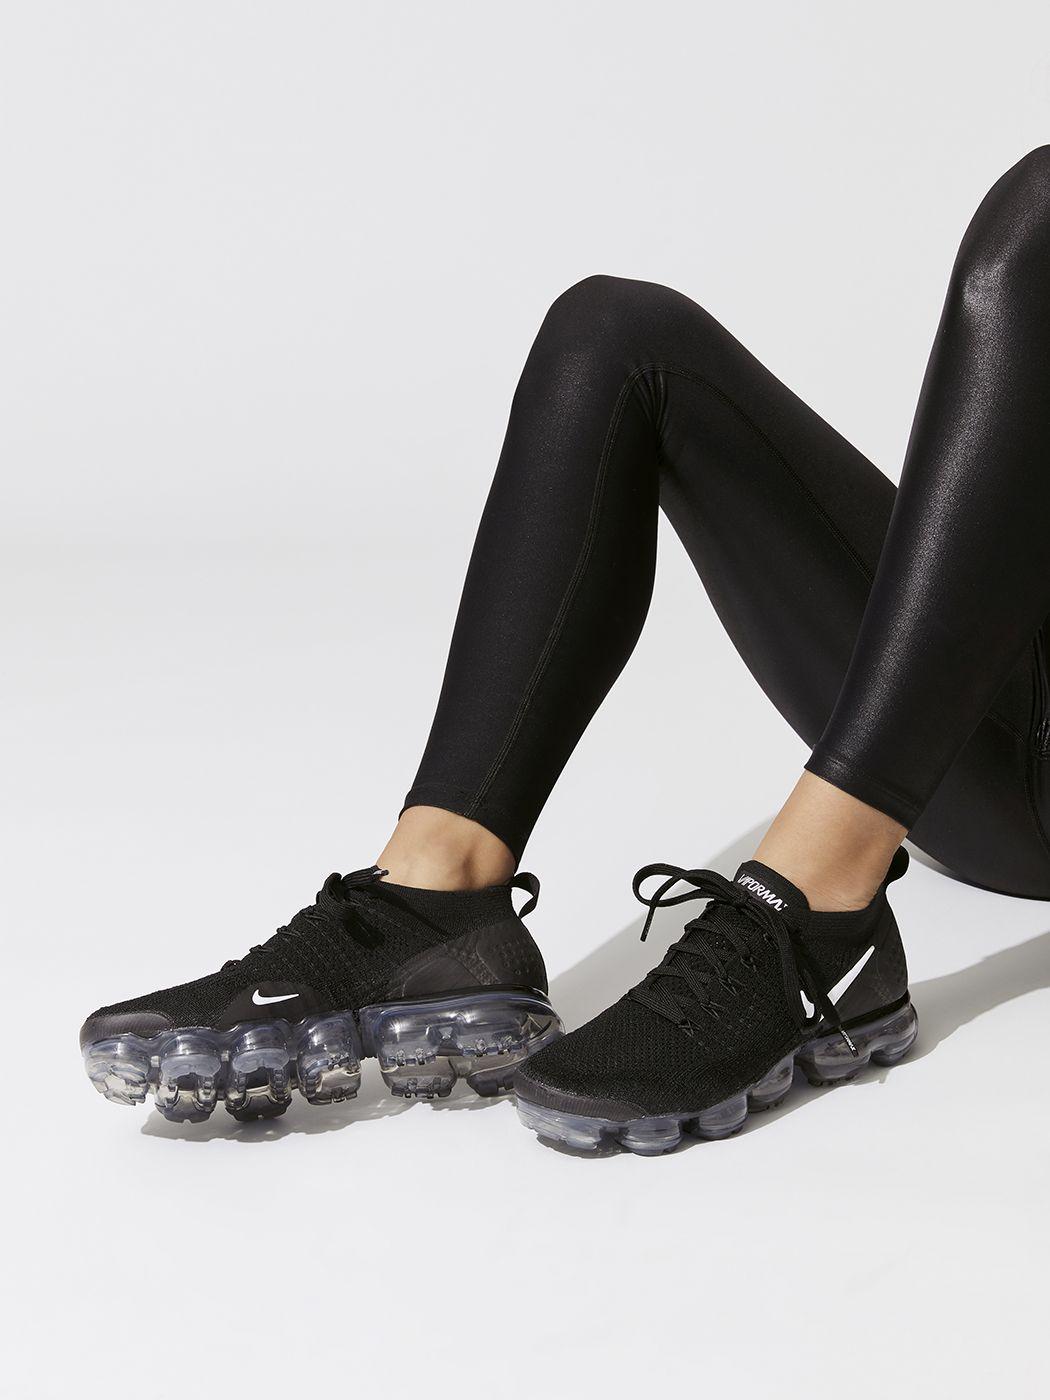 Nike Air Vapormax Flyknit 2 in Black